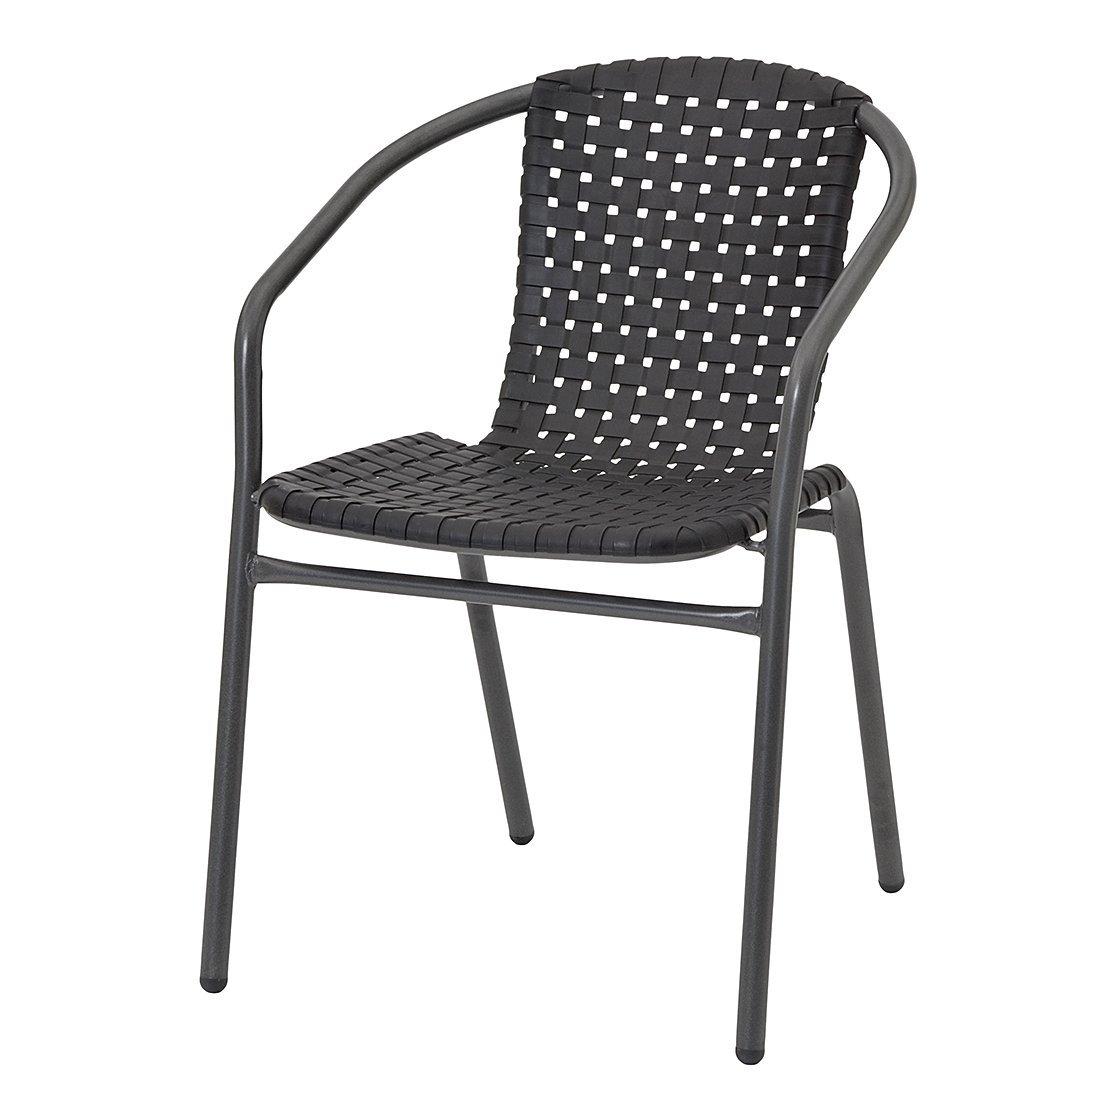 Alu Bistro Sessel mit Kunststoffmatte günstig